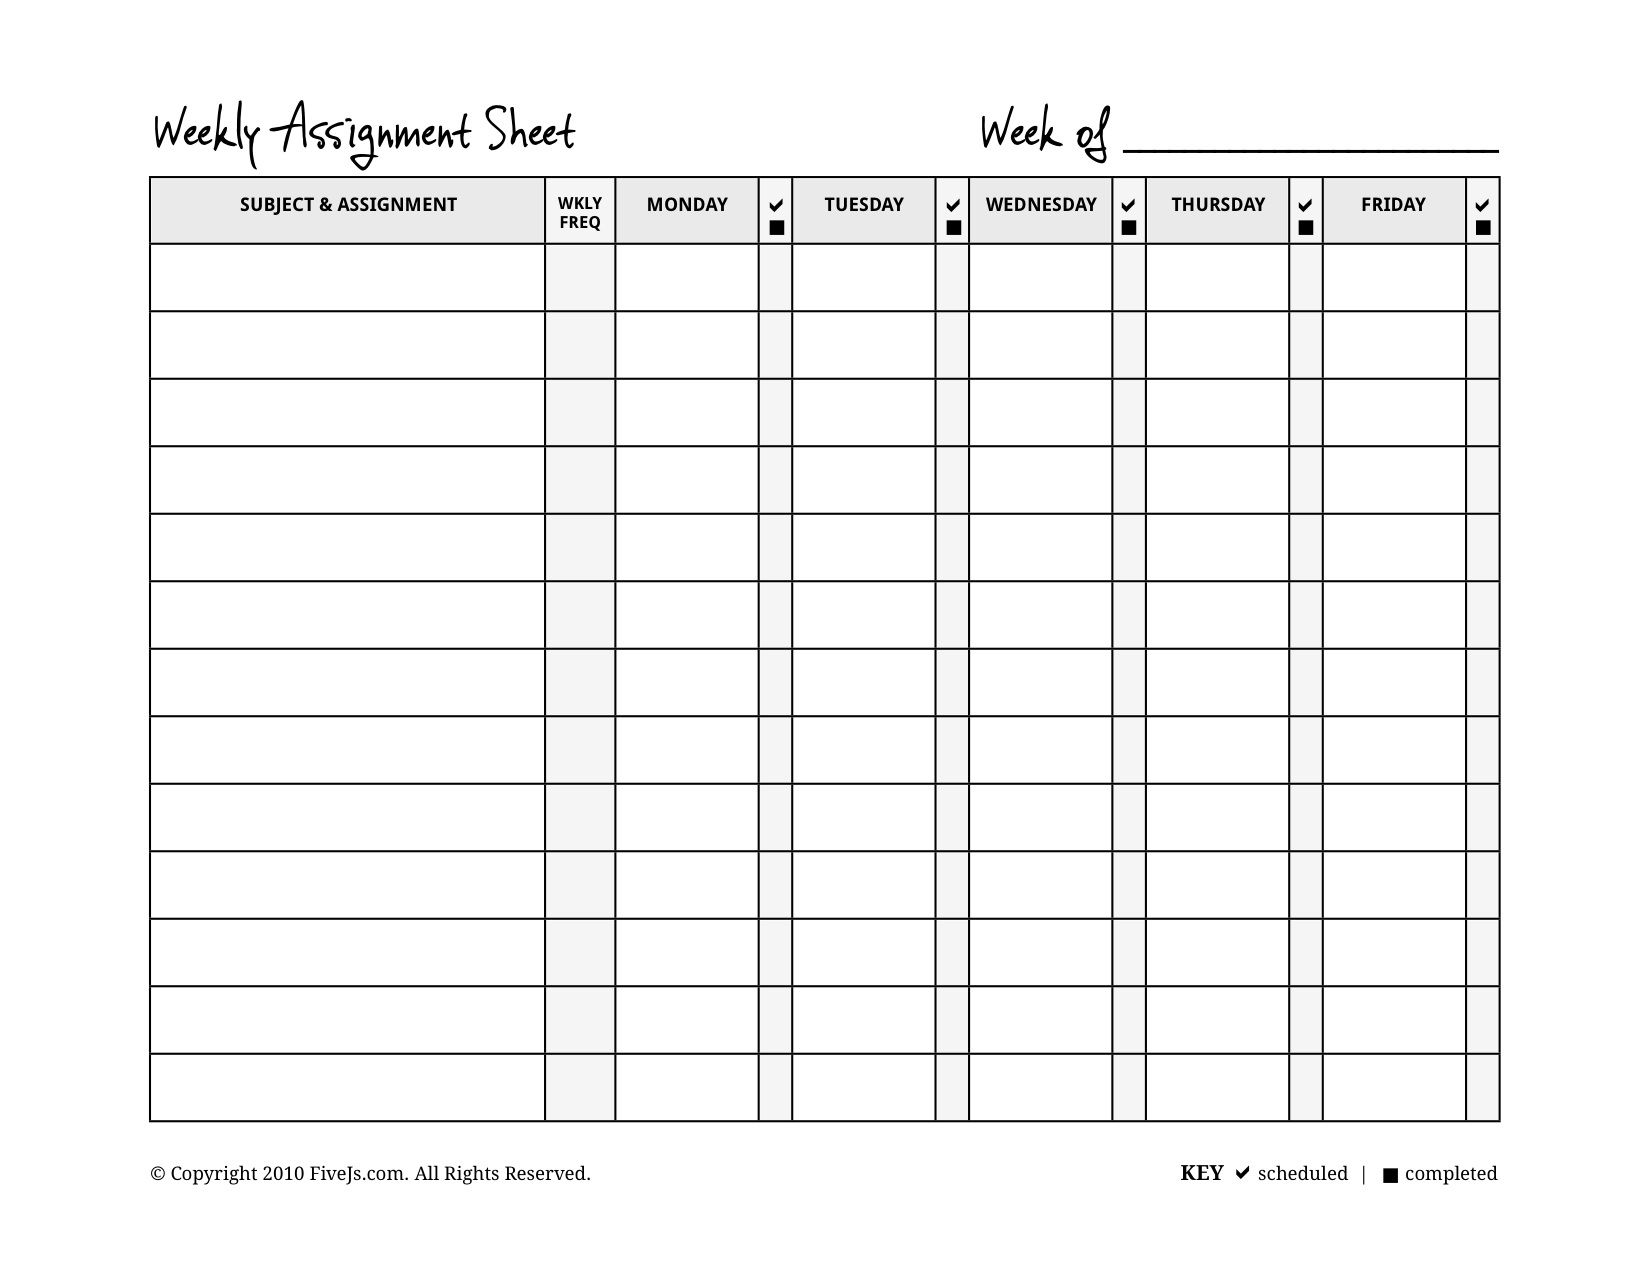 Homeschool Weekly Assignment Planner